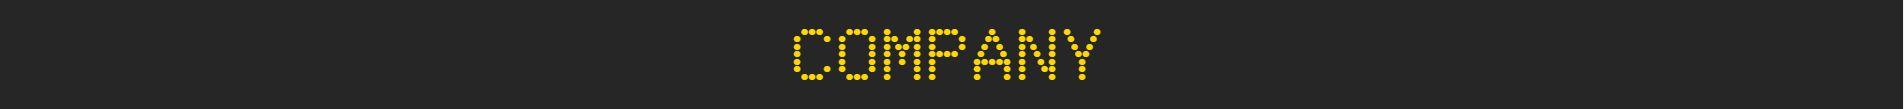 COMPANY CANOR AUDIO informace o firme a spolecnosti canor audio. proklikem se otevre nove okno